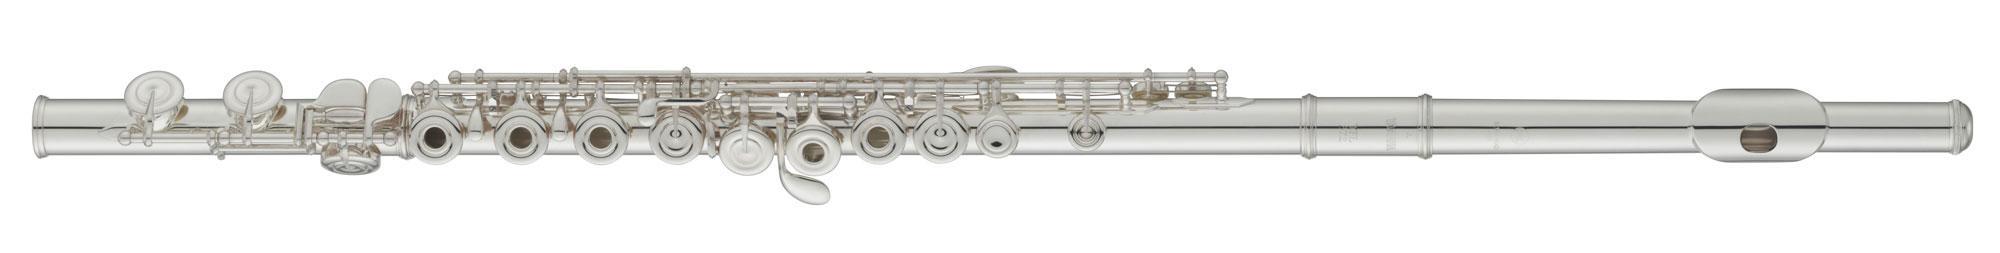 Sonstigeblasinstrumente - Yamaha YFL 272 Querflöte Neusilber Ringklappen - Onlineshop Musikhaus Kirstein